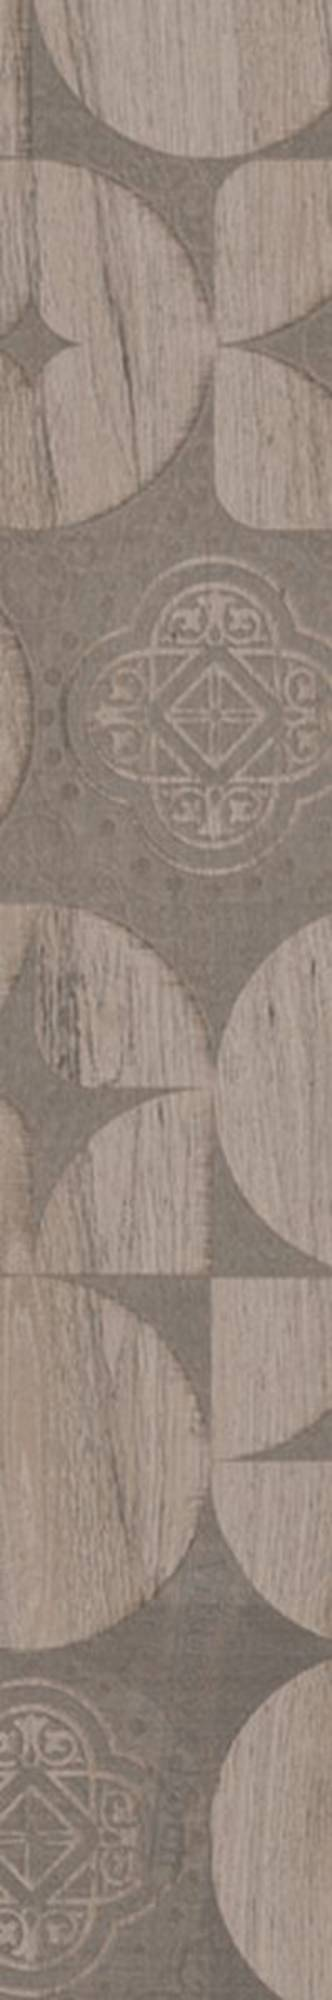 Villeroy & boch Lodge decorstrook 20 x 120 cm. doos a 4 stuks, grijs